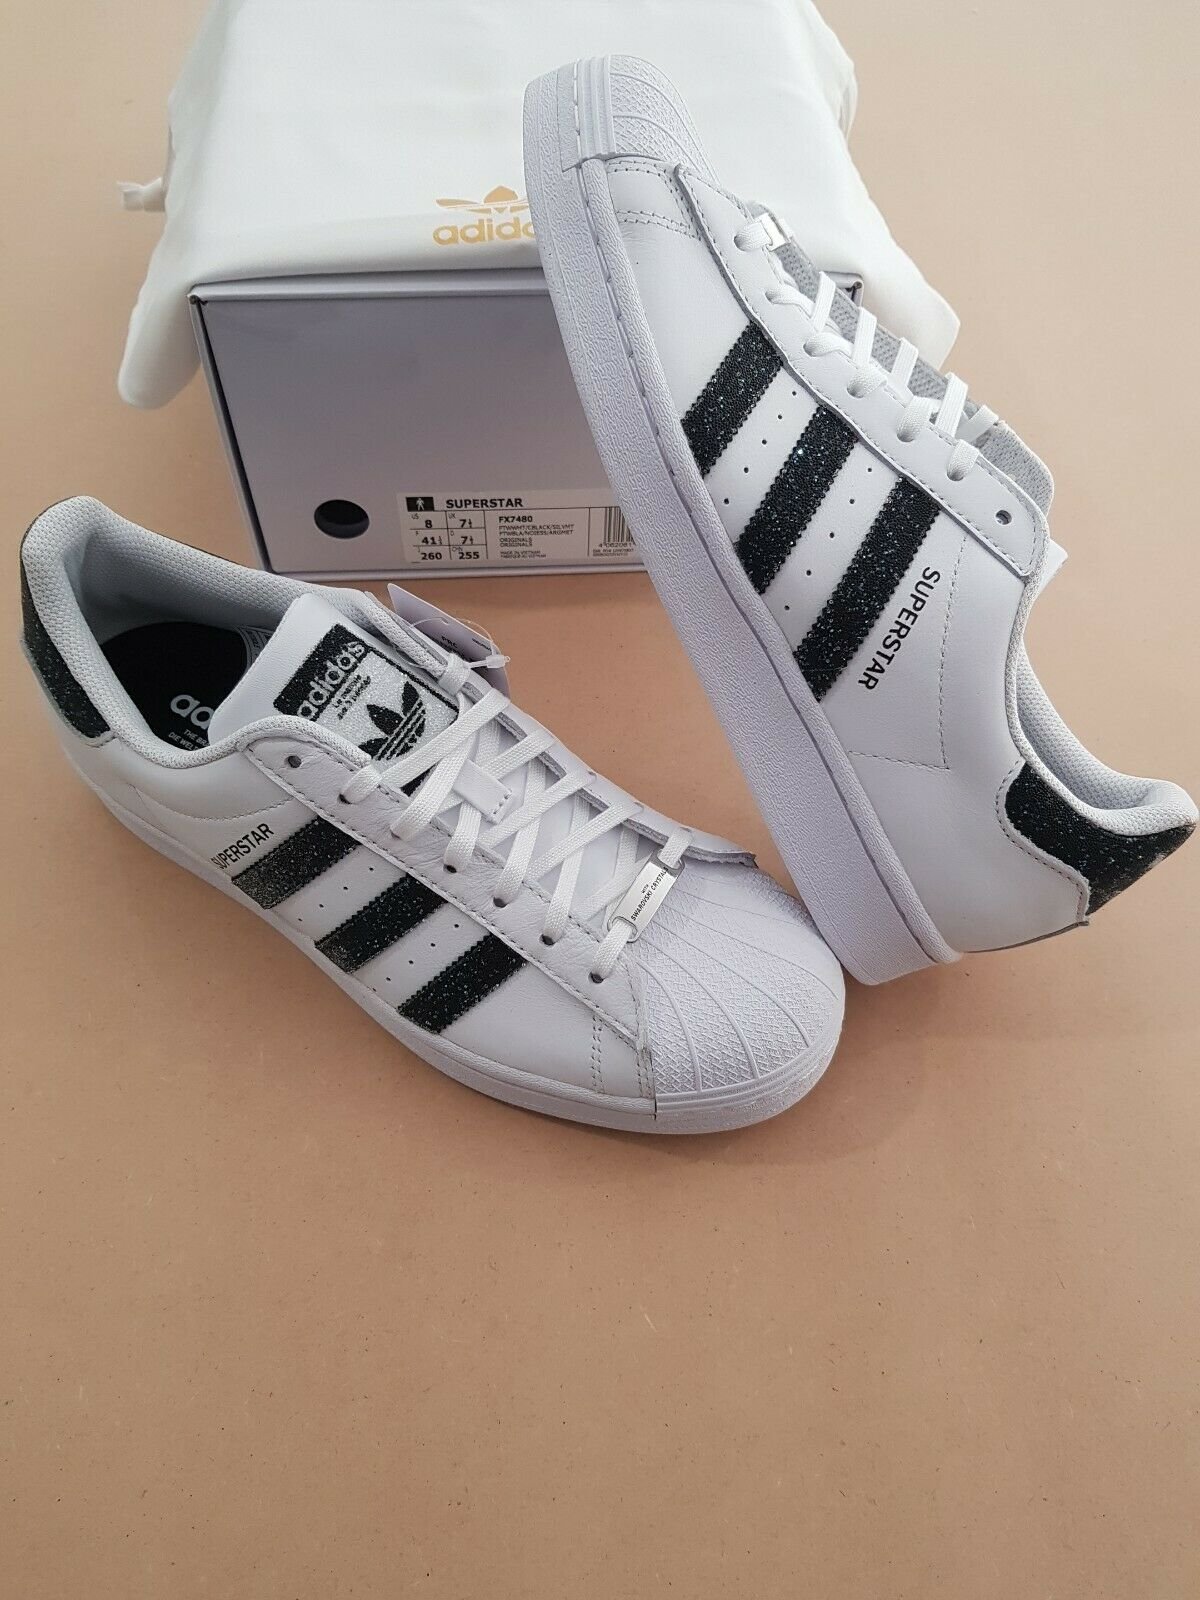 Adidas Superstar Swarovski Mens Sneakers Cloud White/Core Black FX7480 SIZE 8 US